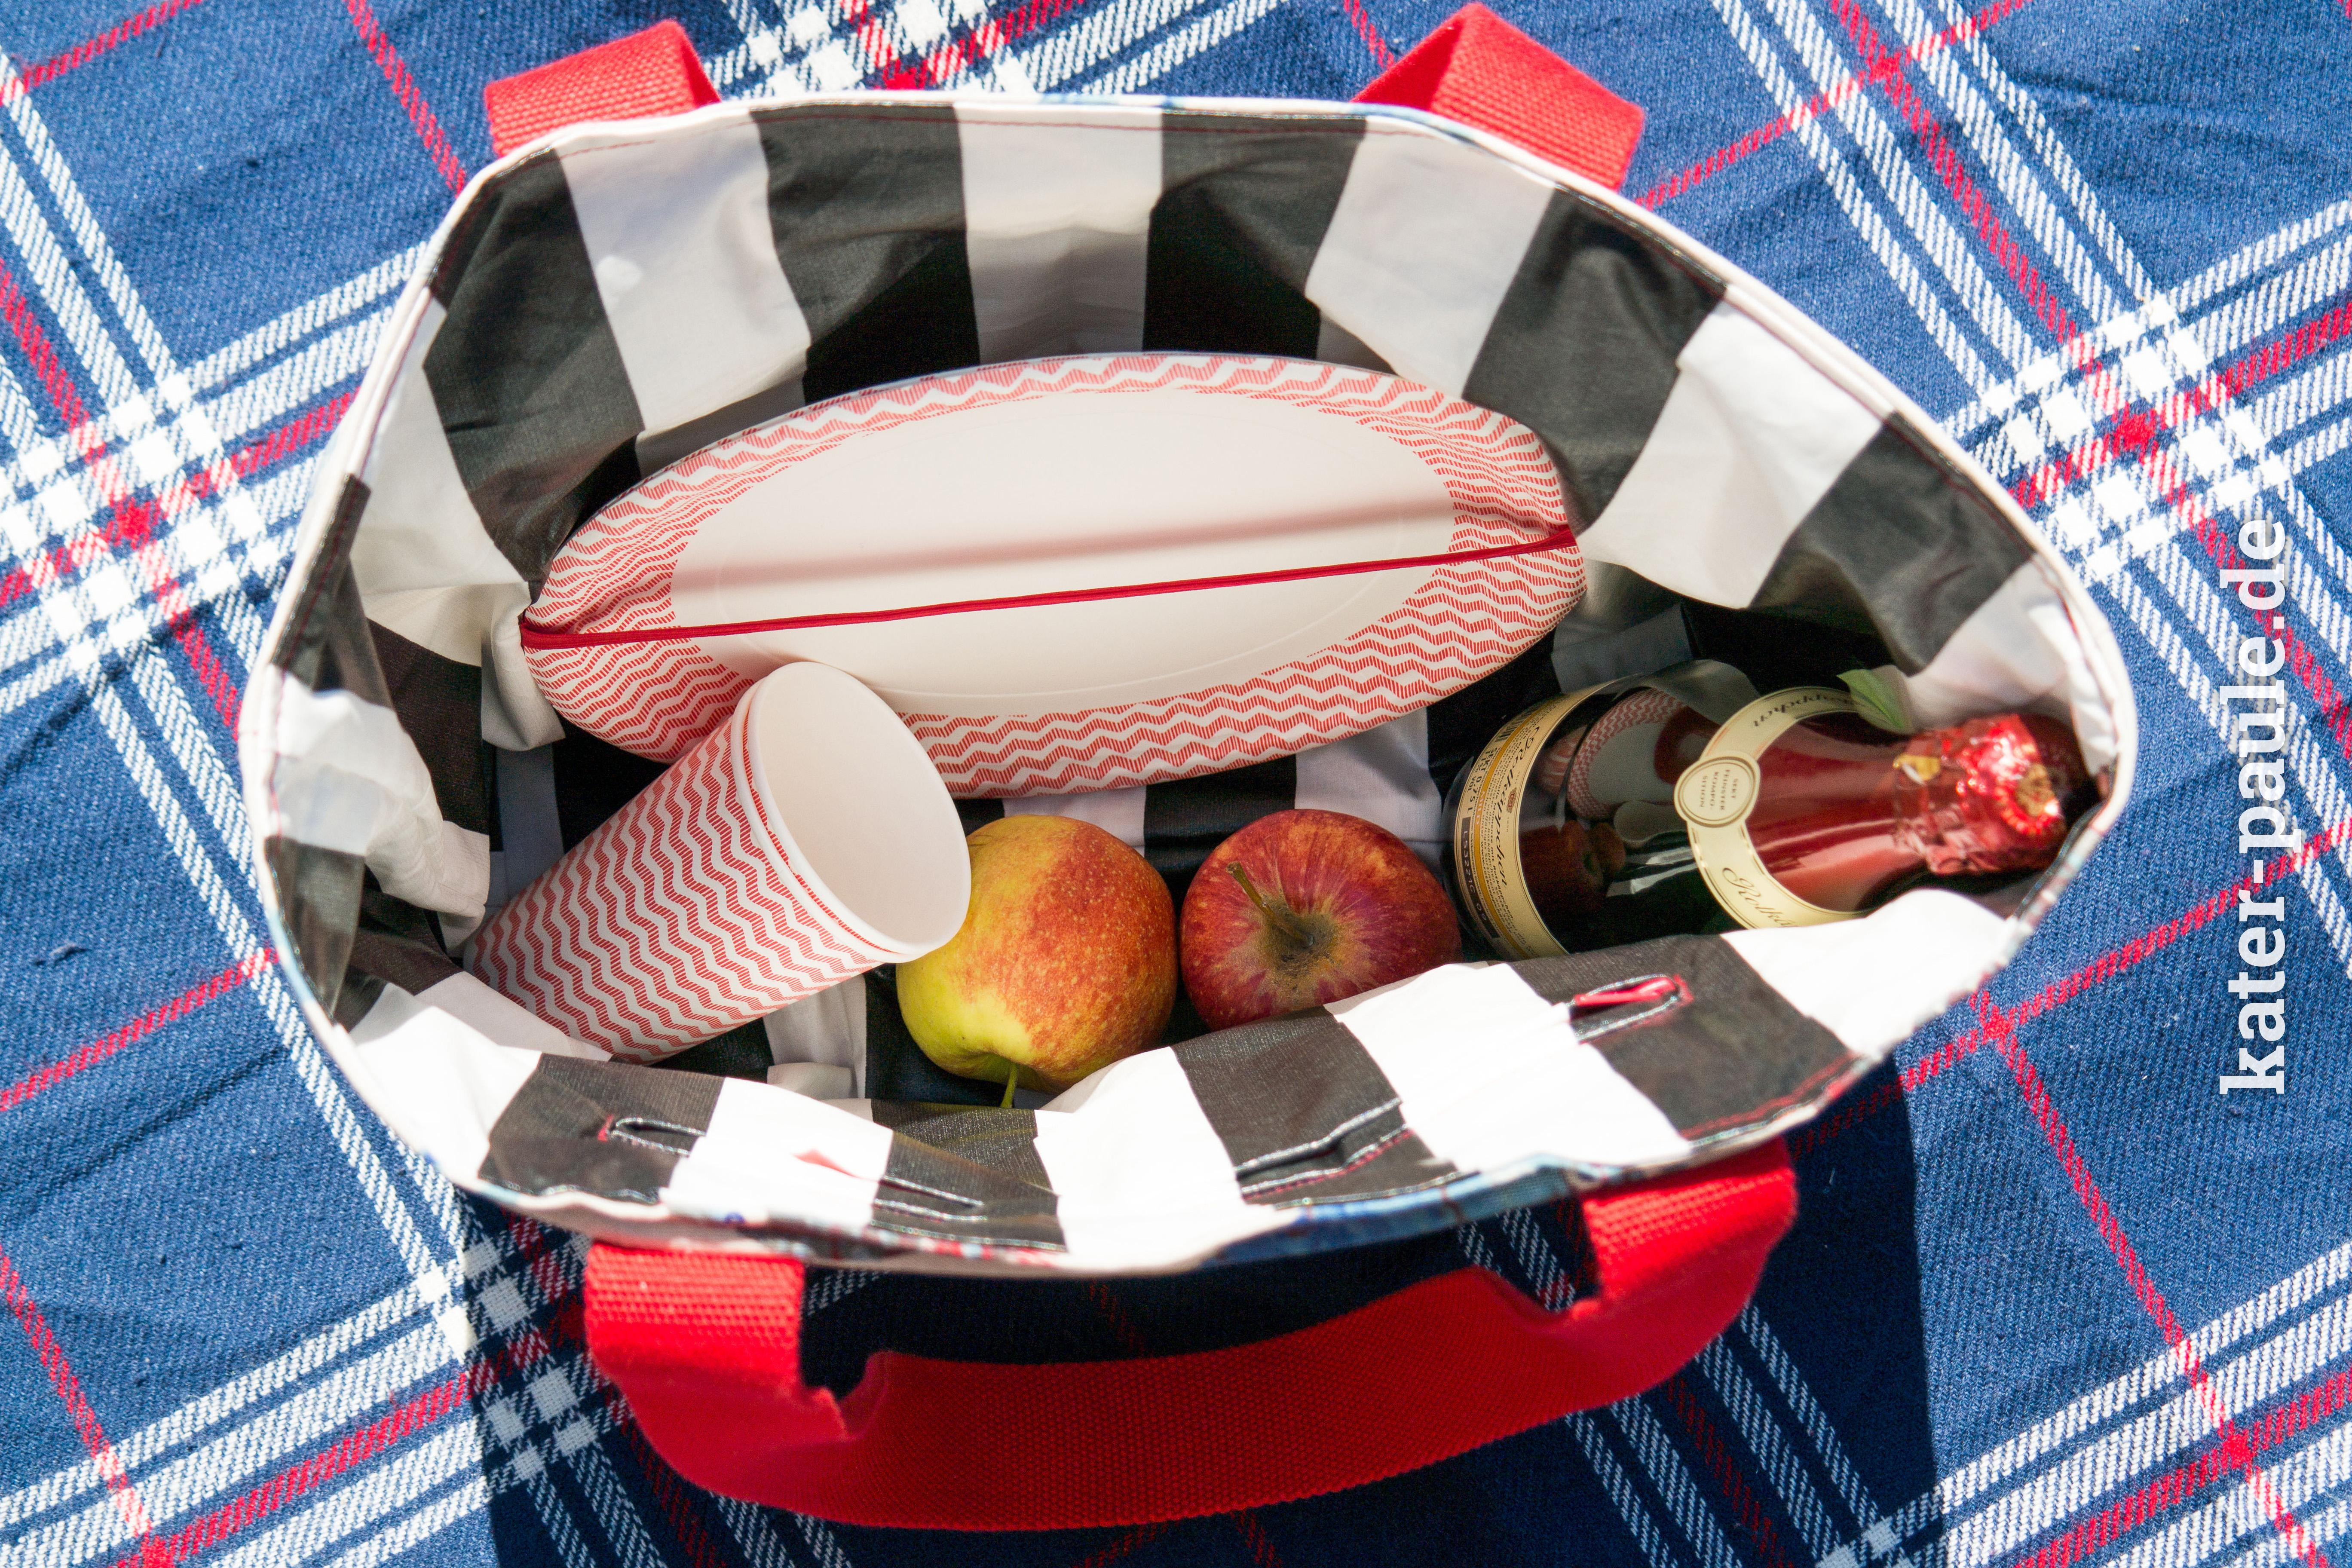 Picknicktasche / Freebook / Tasche / SnapPap / DIY / Wachstuch / Kater Paule / Nähgedöns